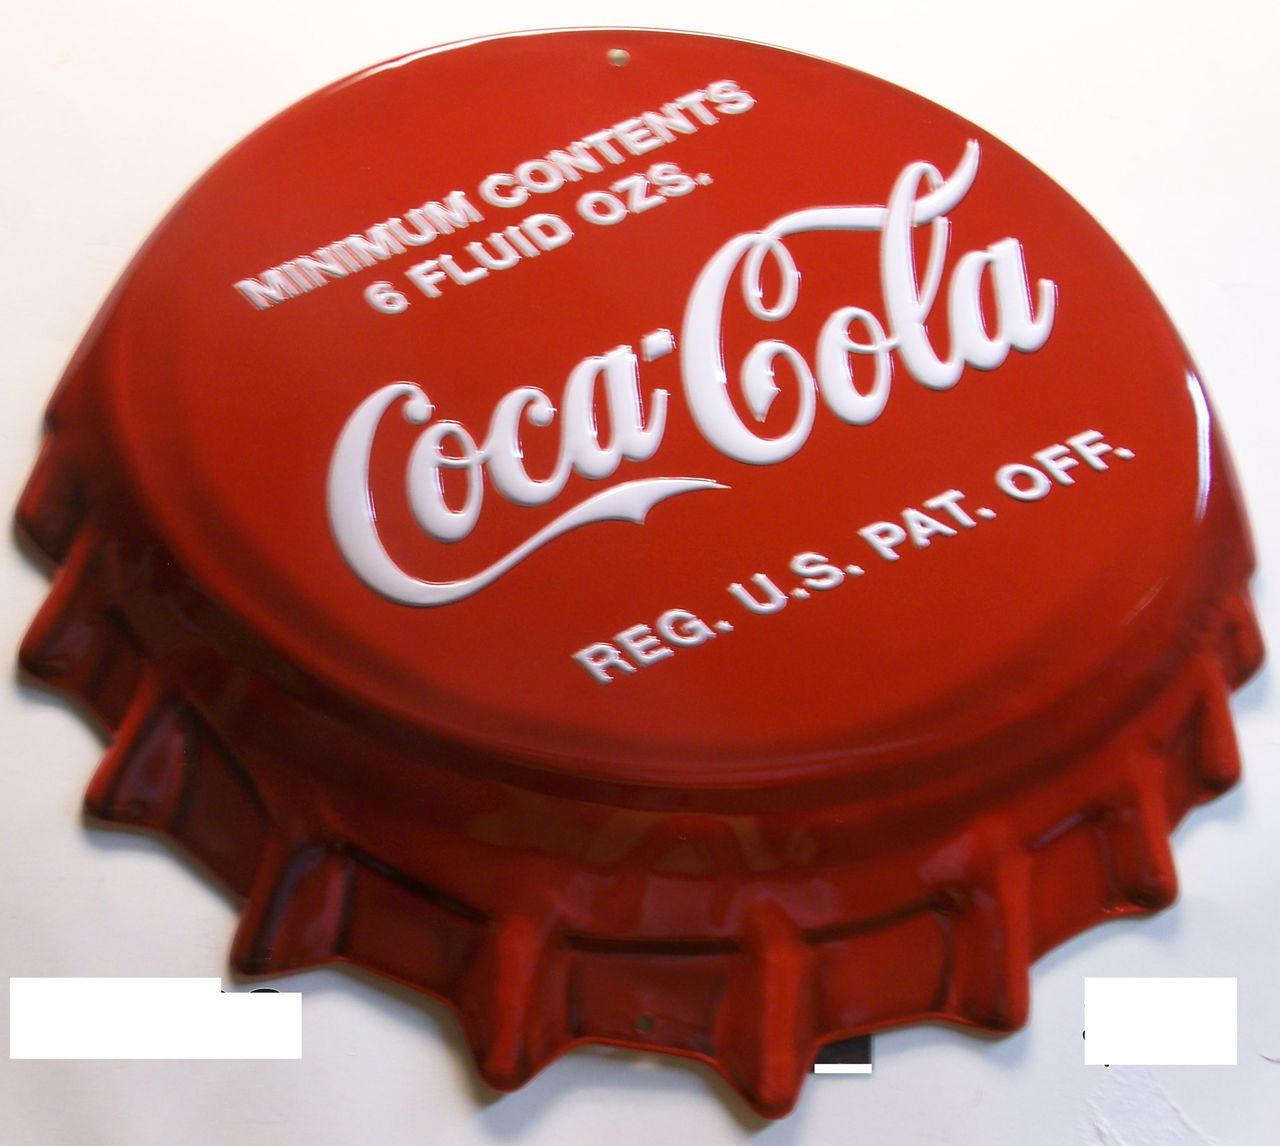 ee51913e678d COKE RETRO COCA-COLA DIE-CUT, EMBOSSED BOTTLE CAP TIN SIGN